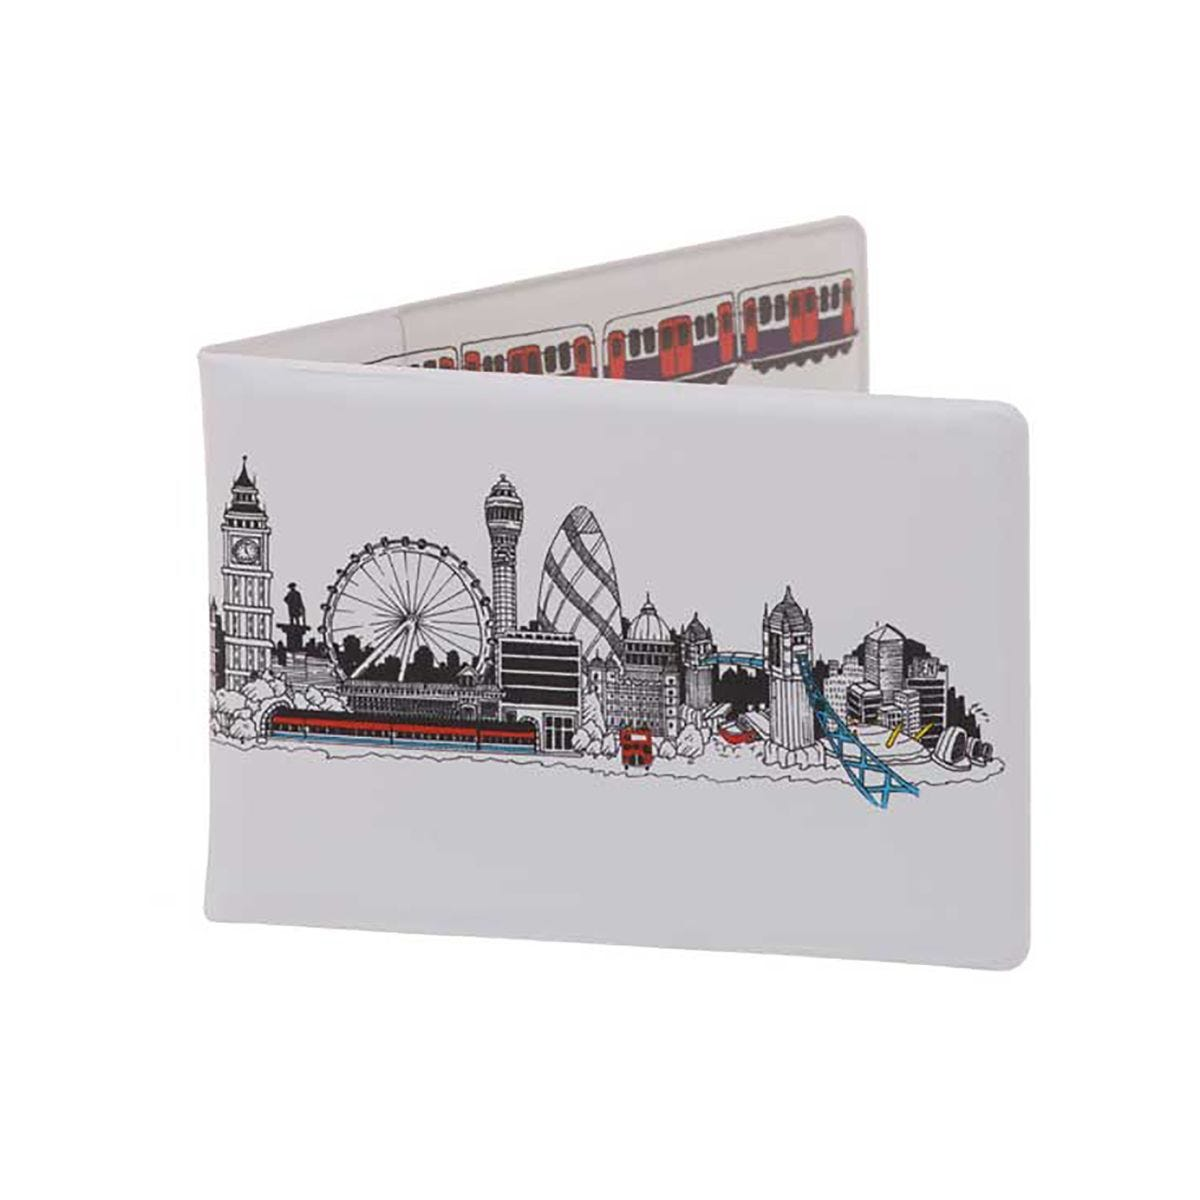 London Skyline Travel Card Wallet